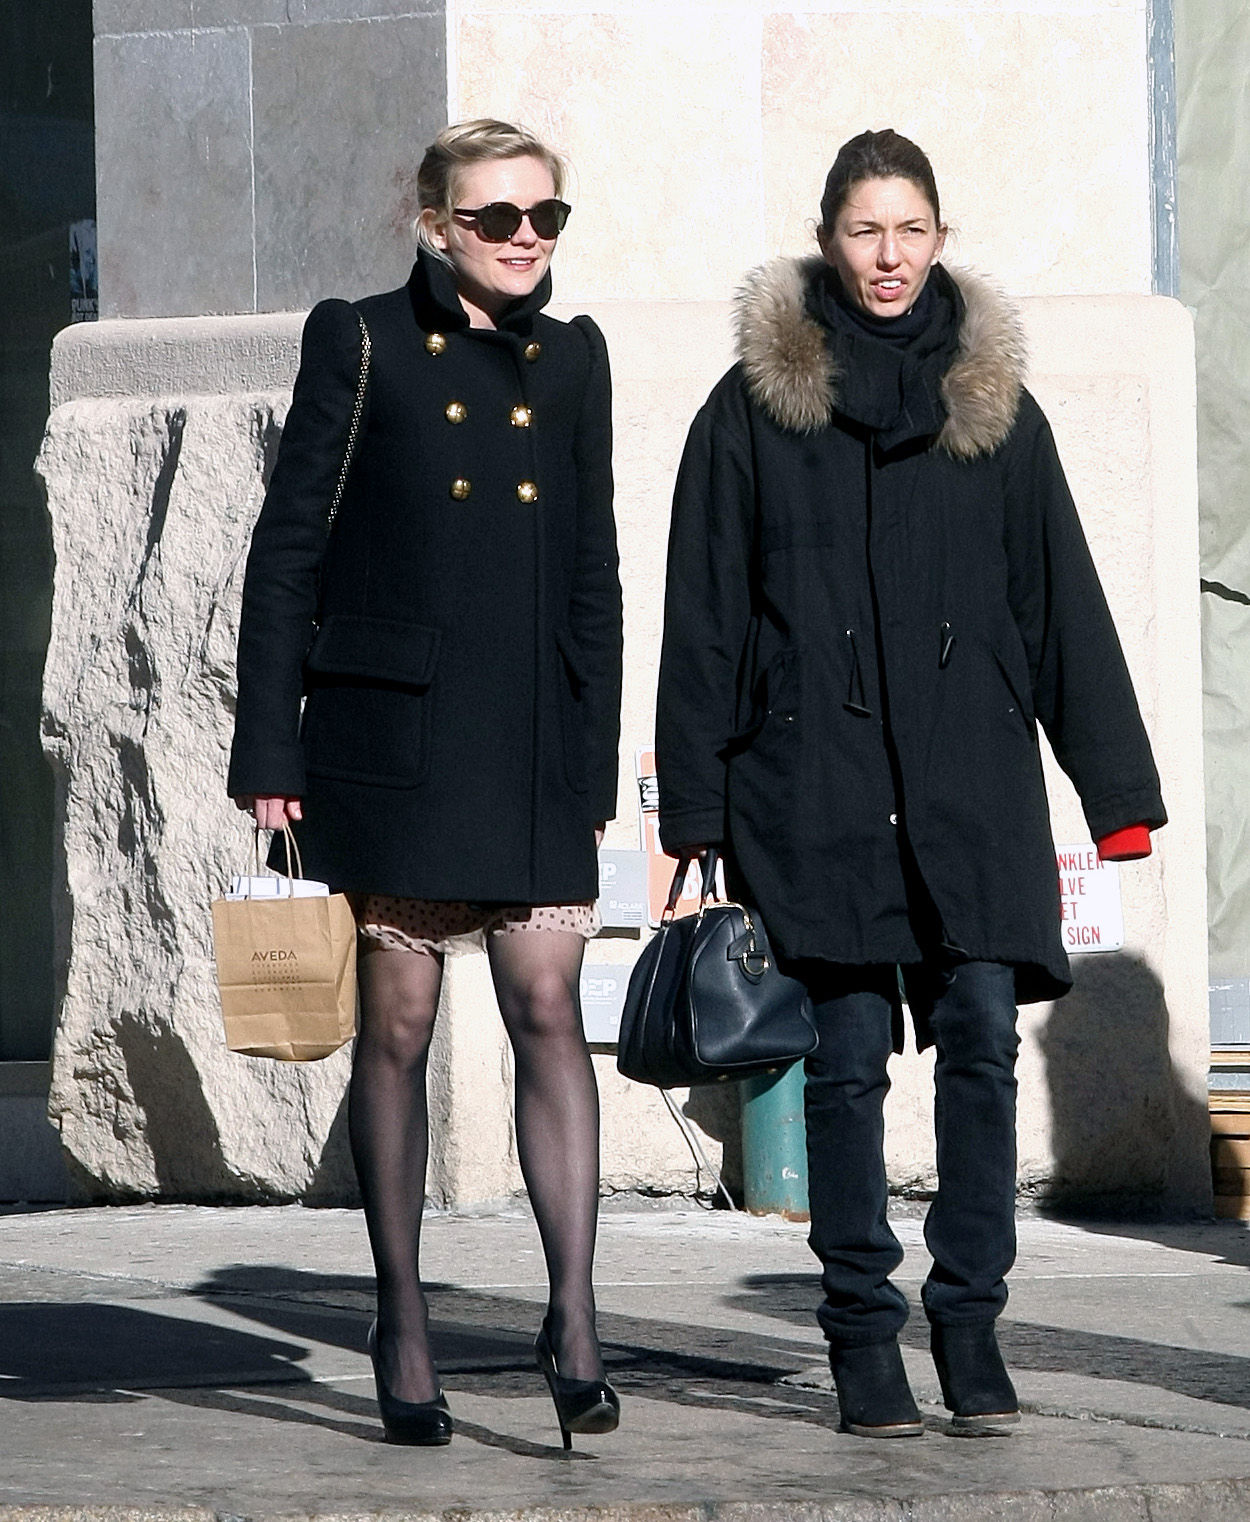 sofia coppola: new york fashion week  sofia coppola: ...